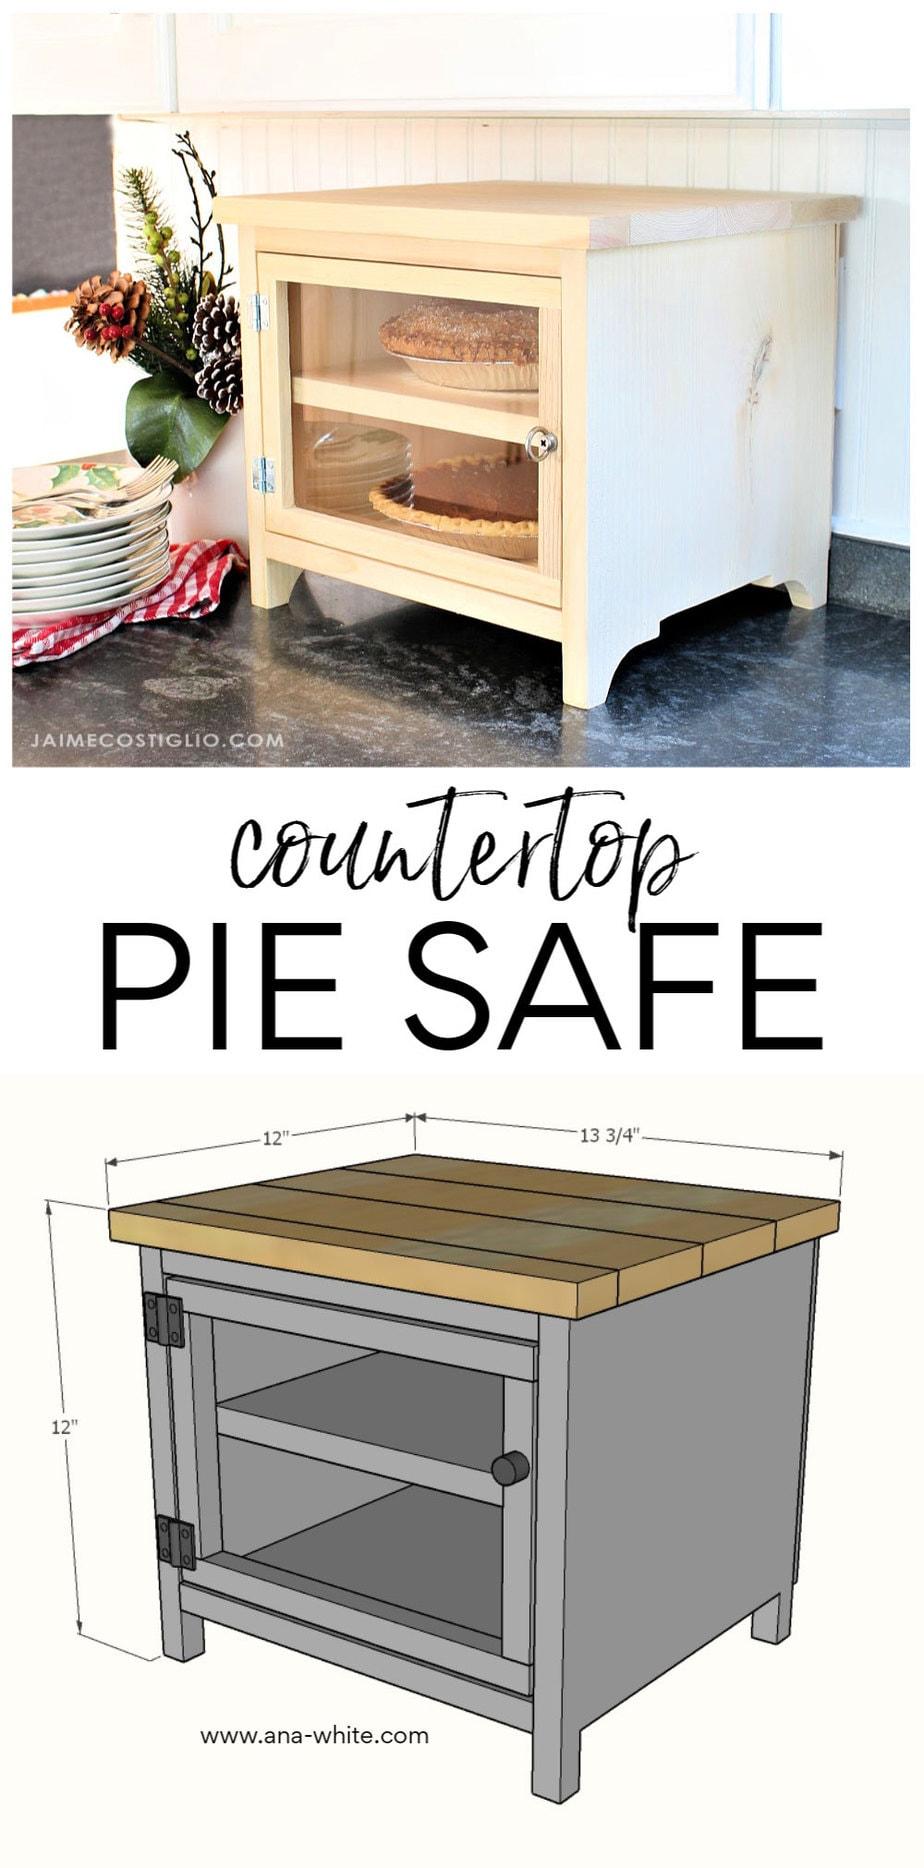 diy countertop pie safe free plans